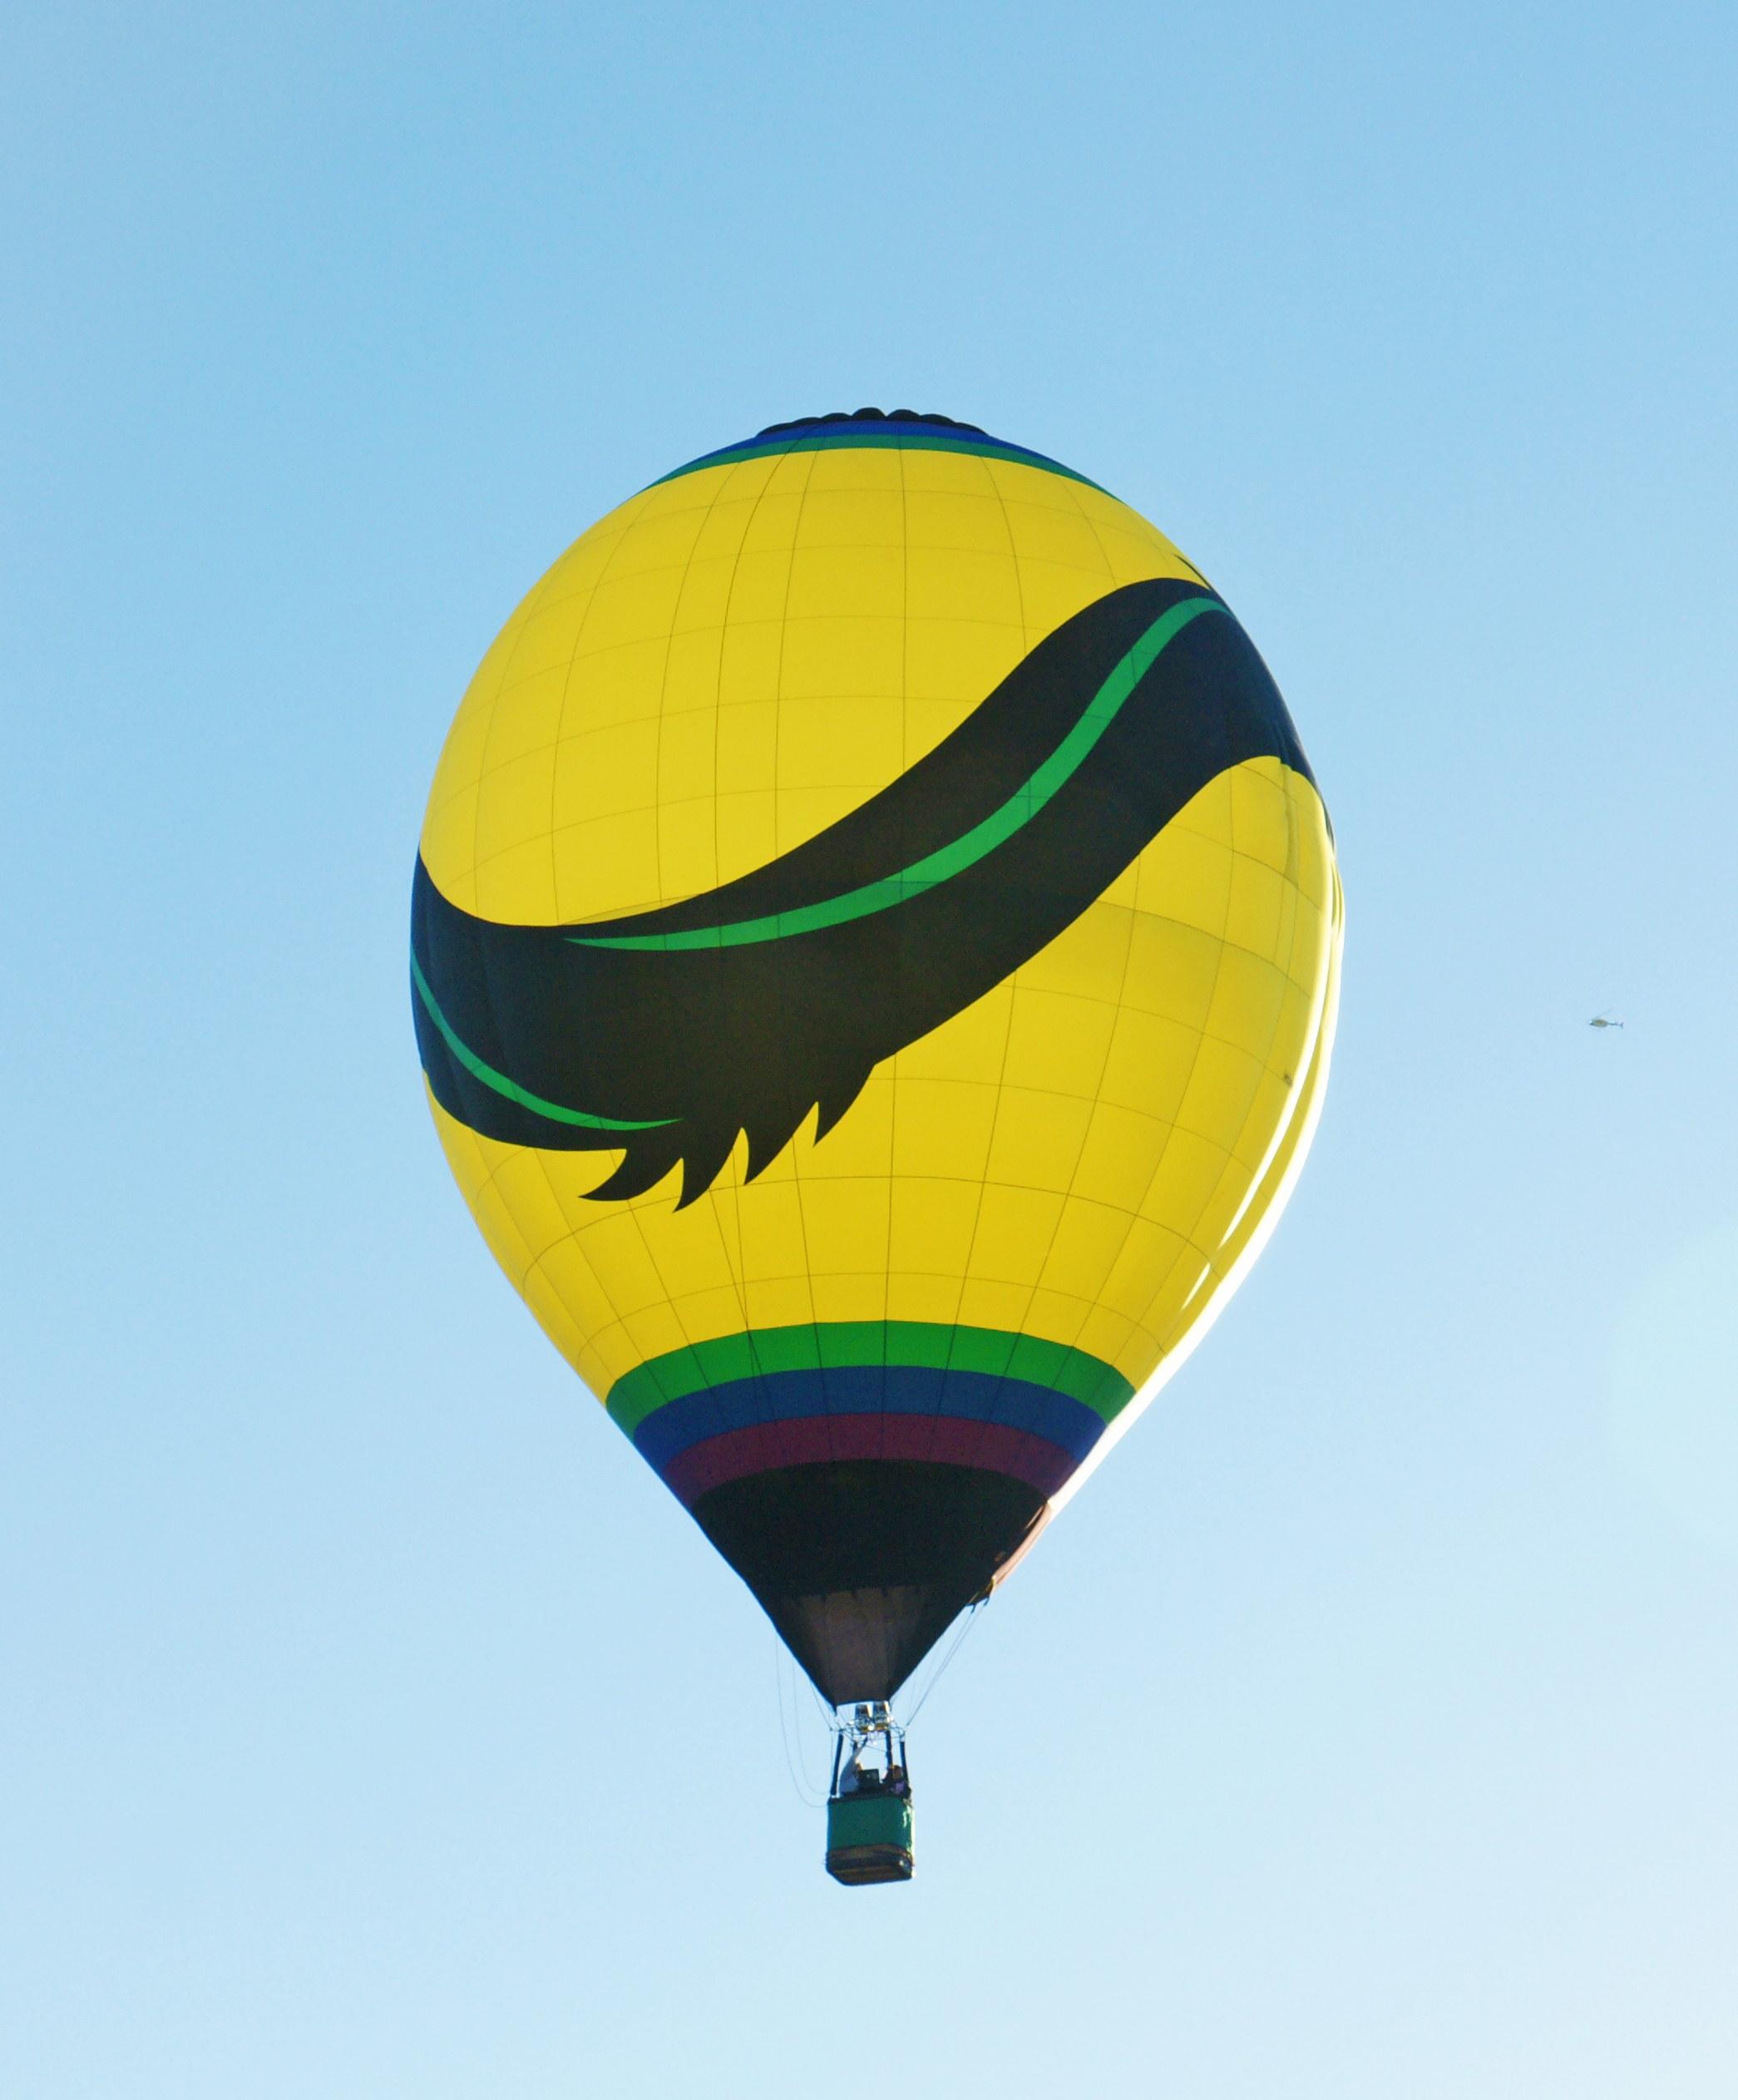 aibf-Single-Balloons-Gallery13